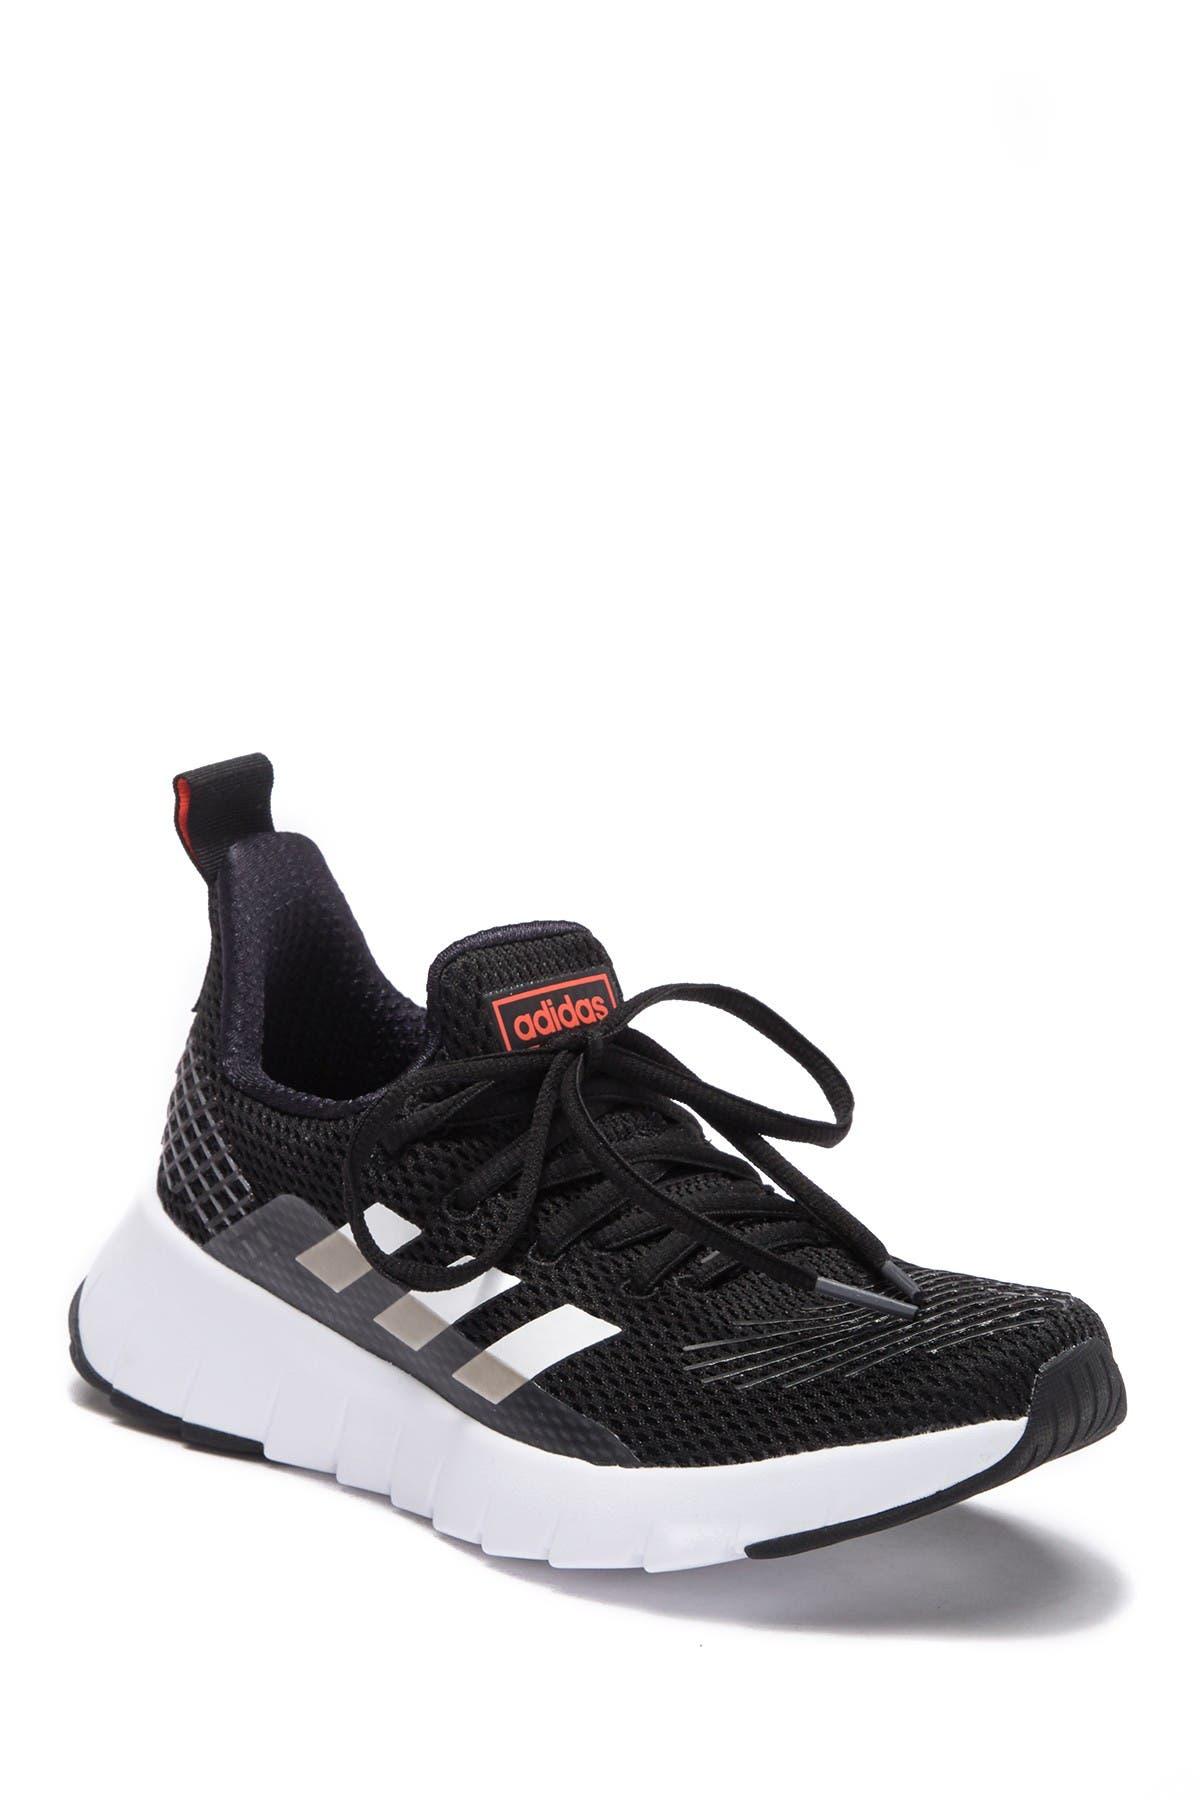 adidas | Asweego Training Sneaker